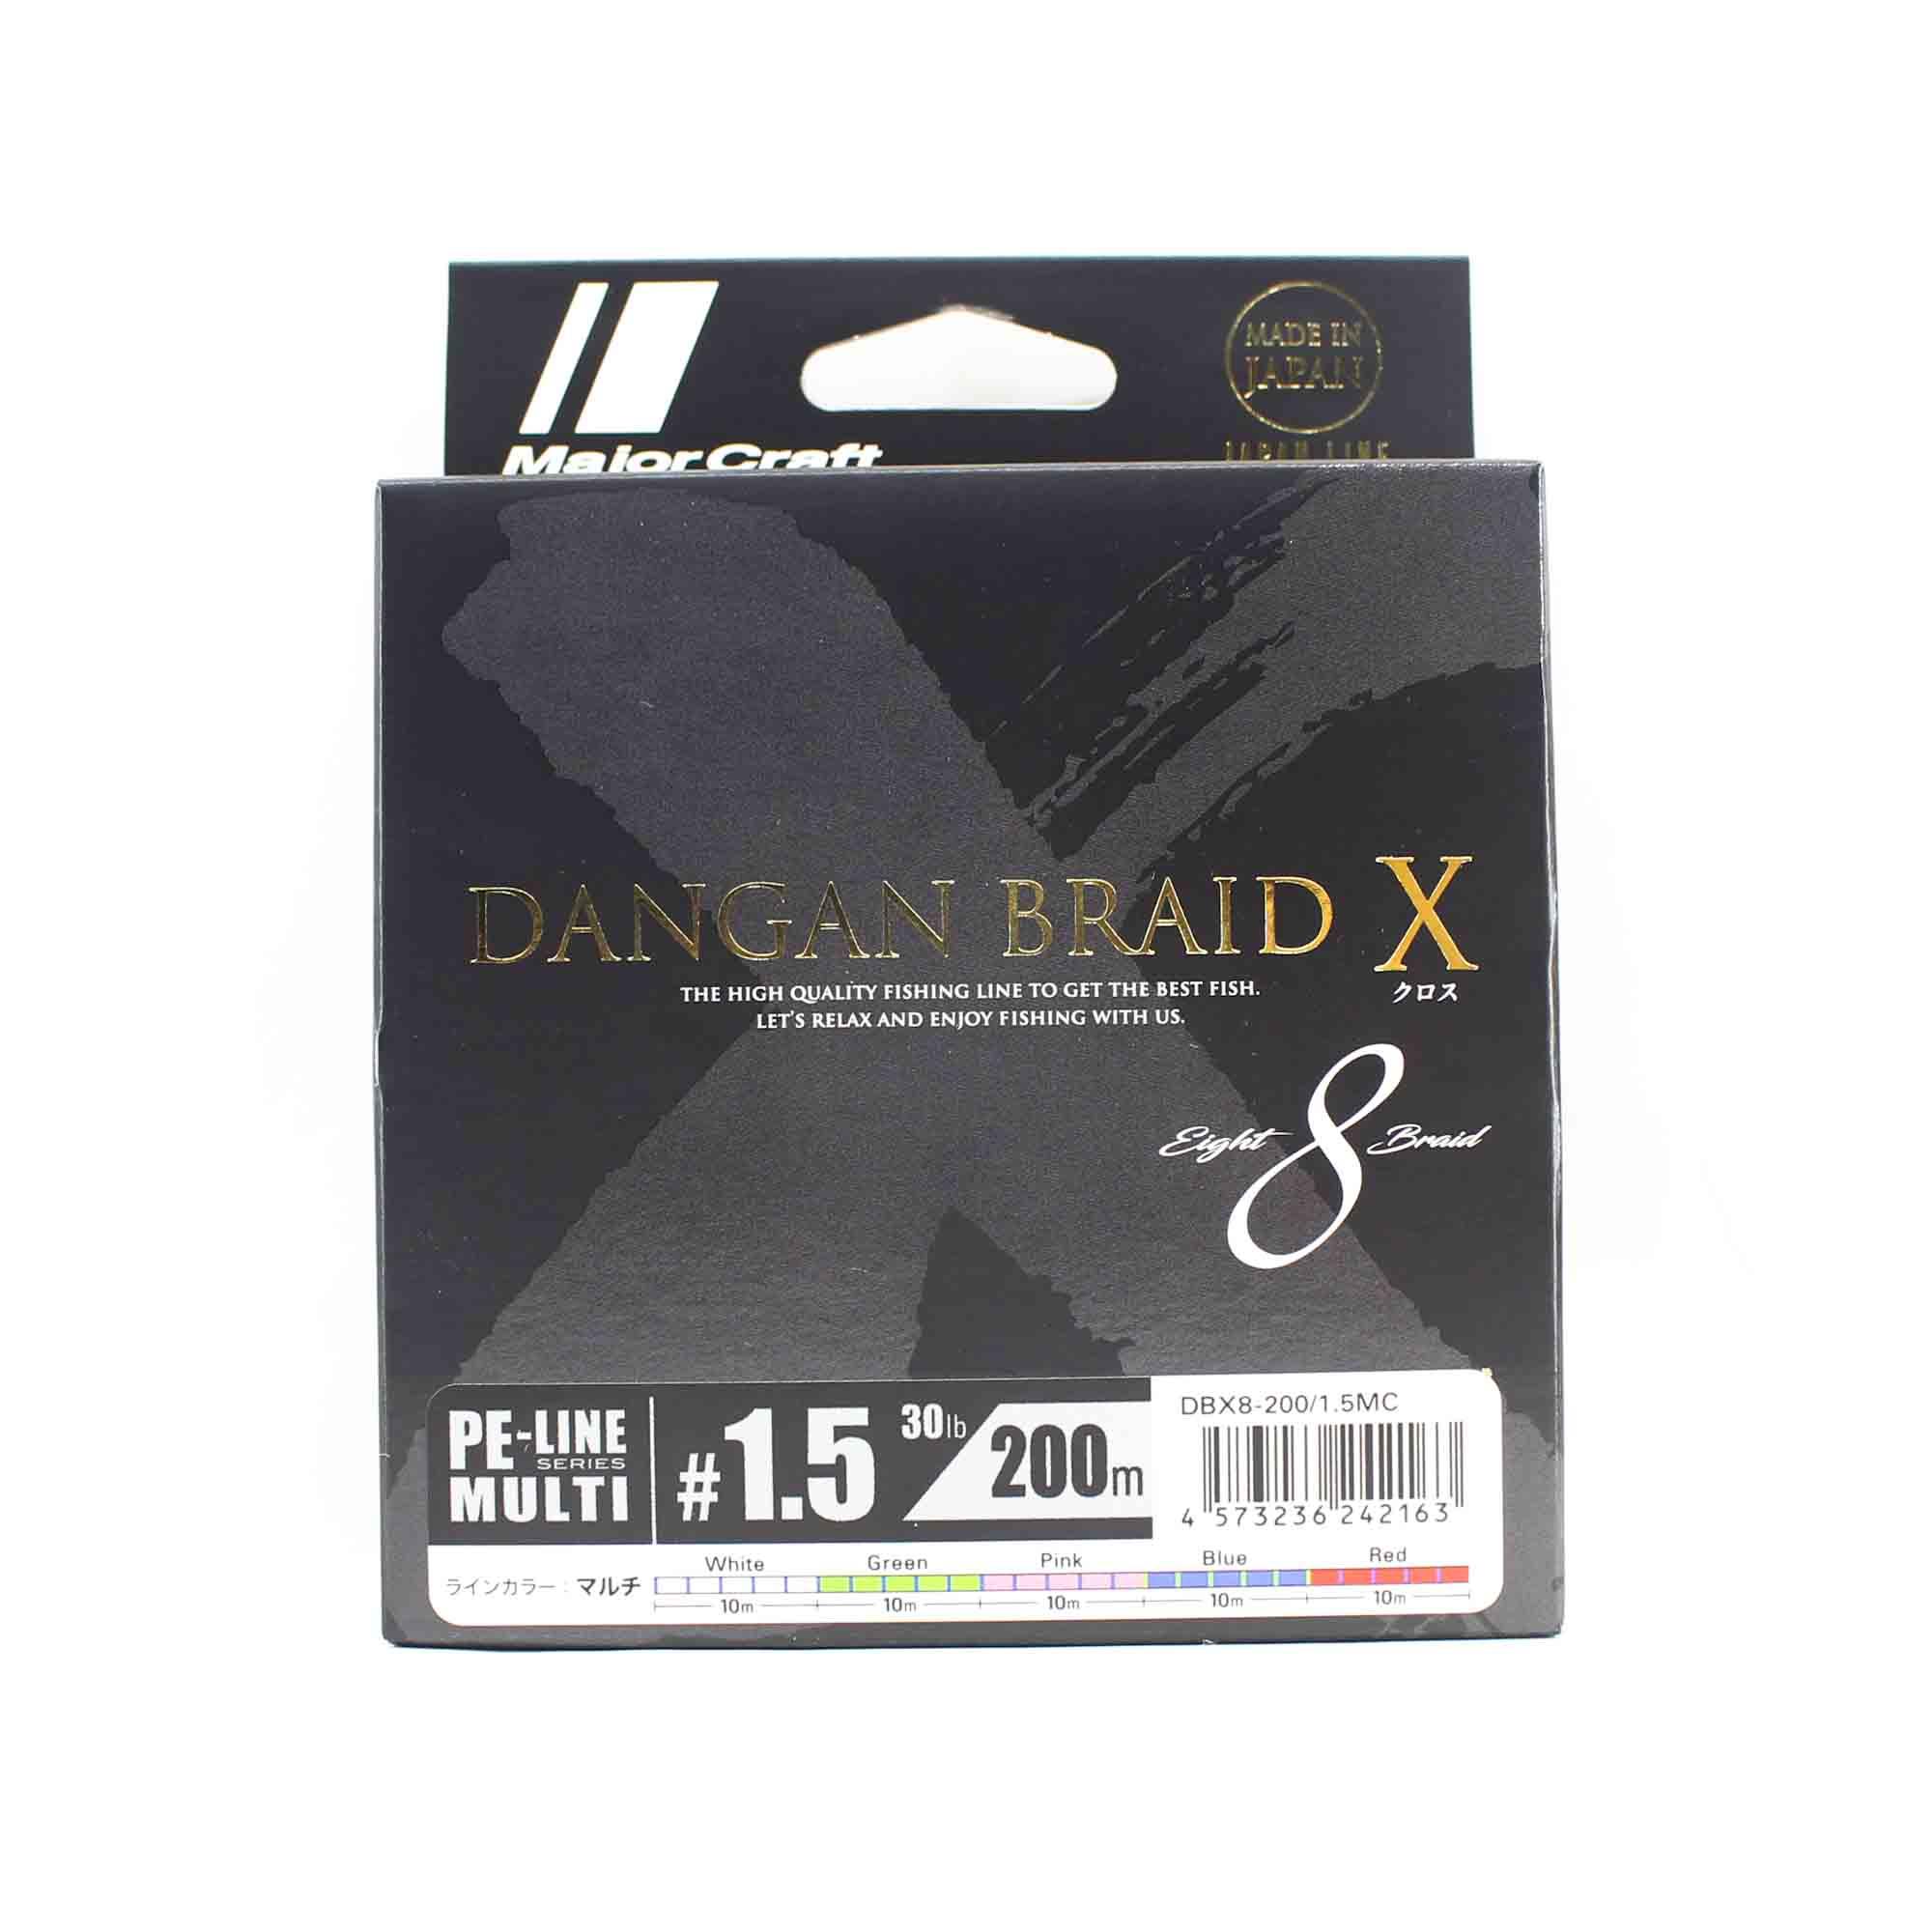 Major Craft Dangan Braid X Line X8 200m P.E 1.5 Multi DBX8-200/1.5MC (2163)